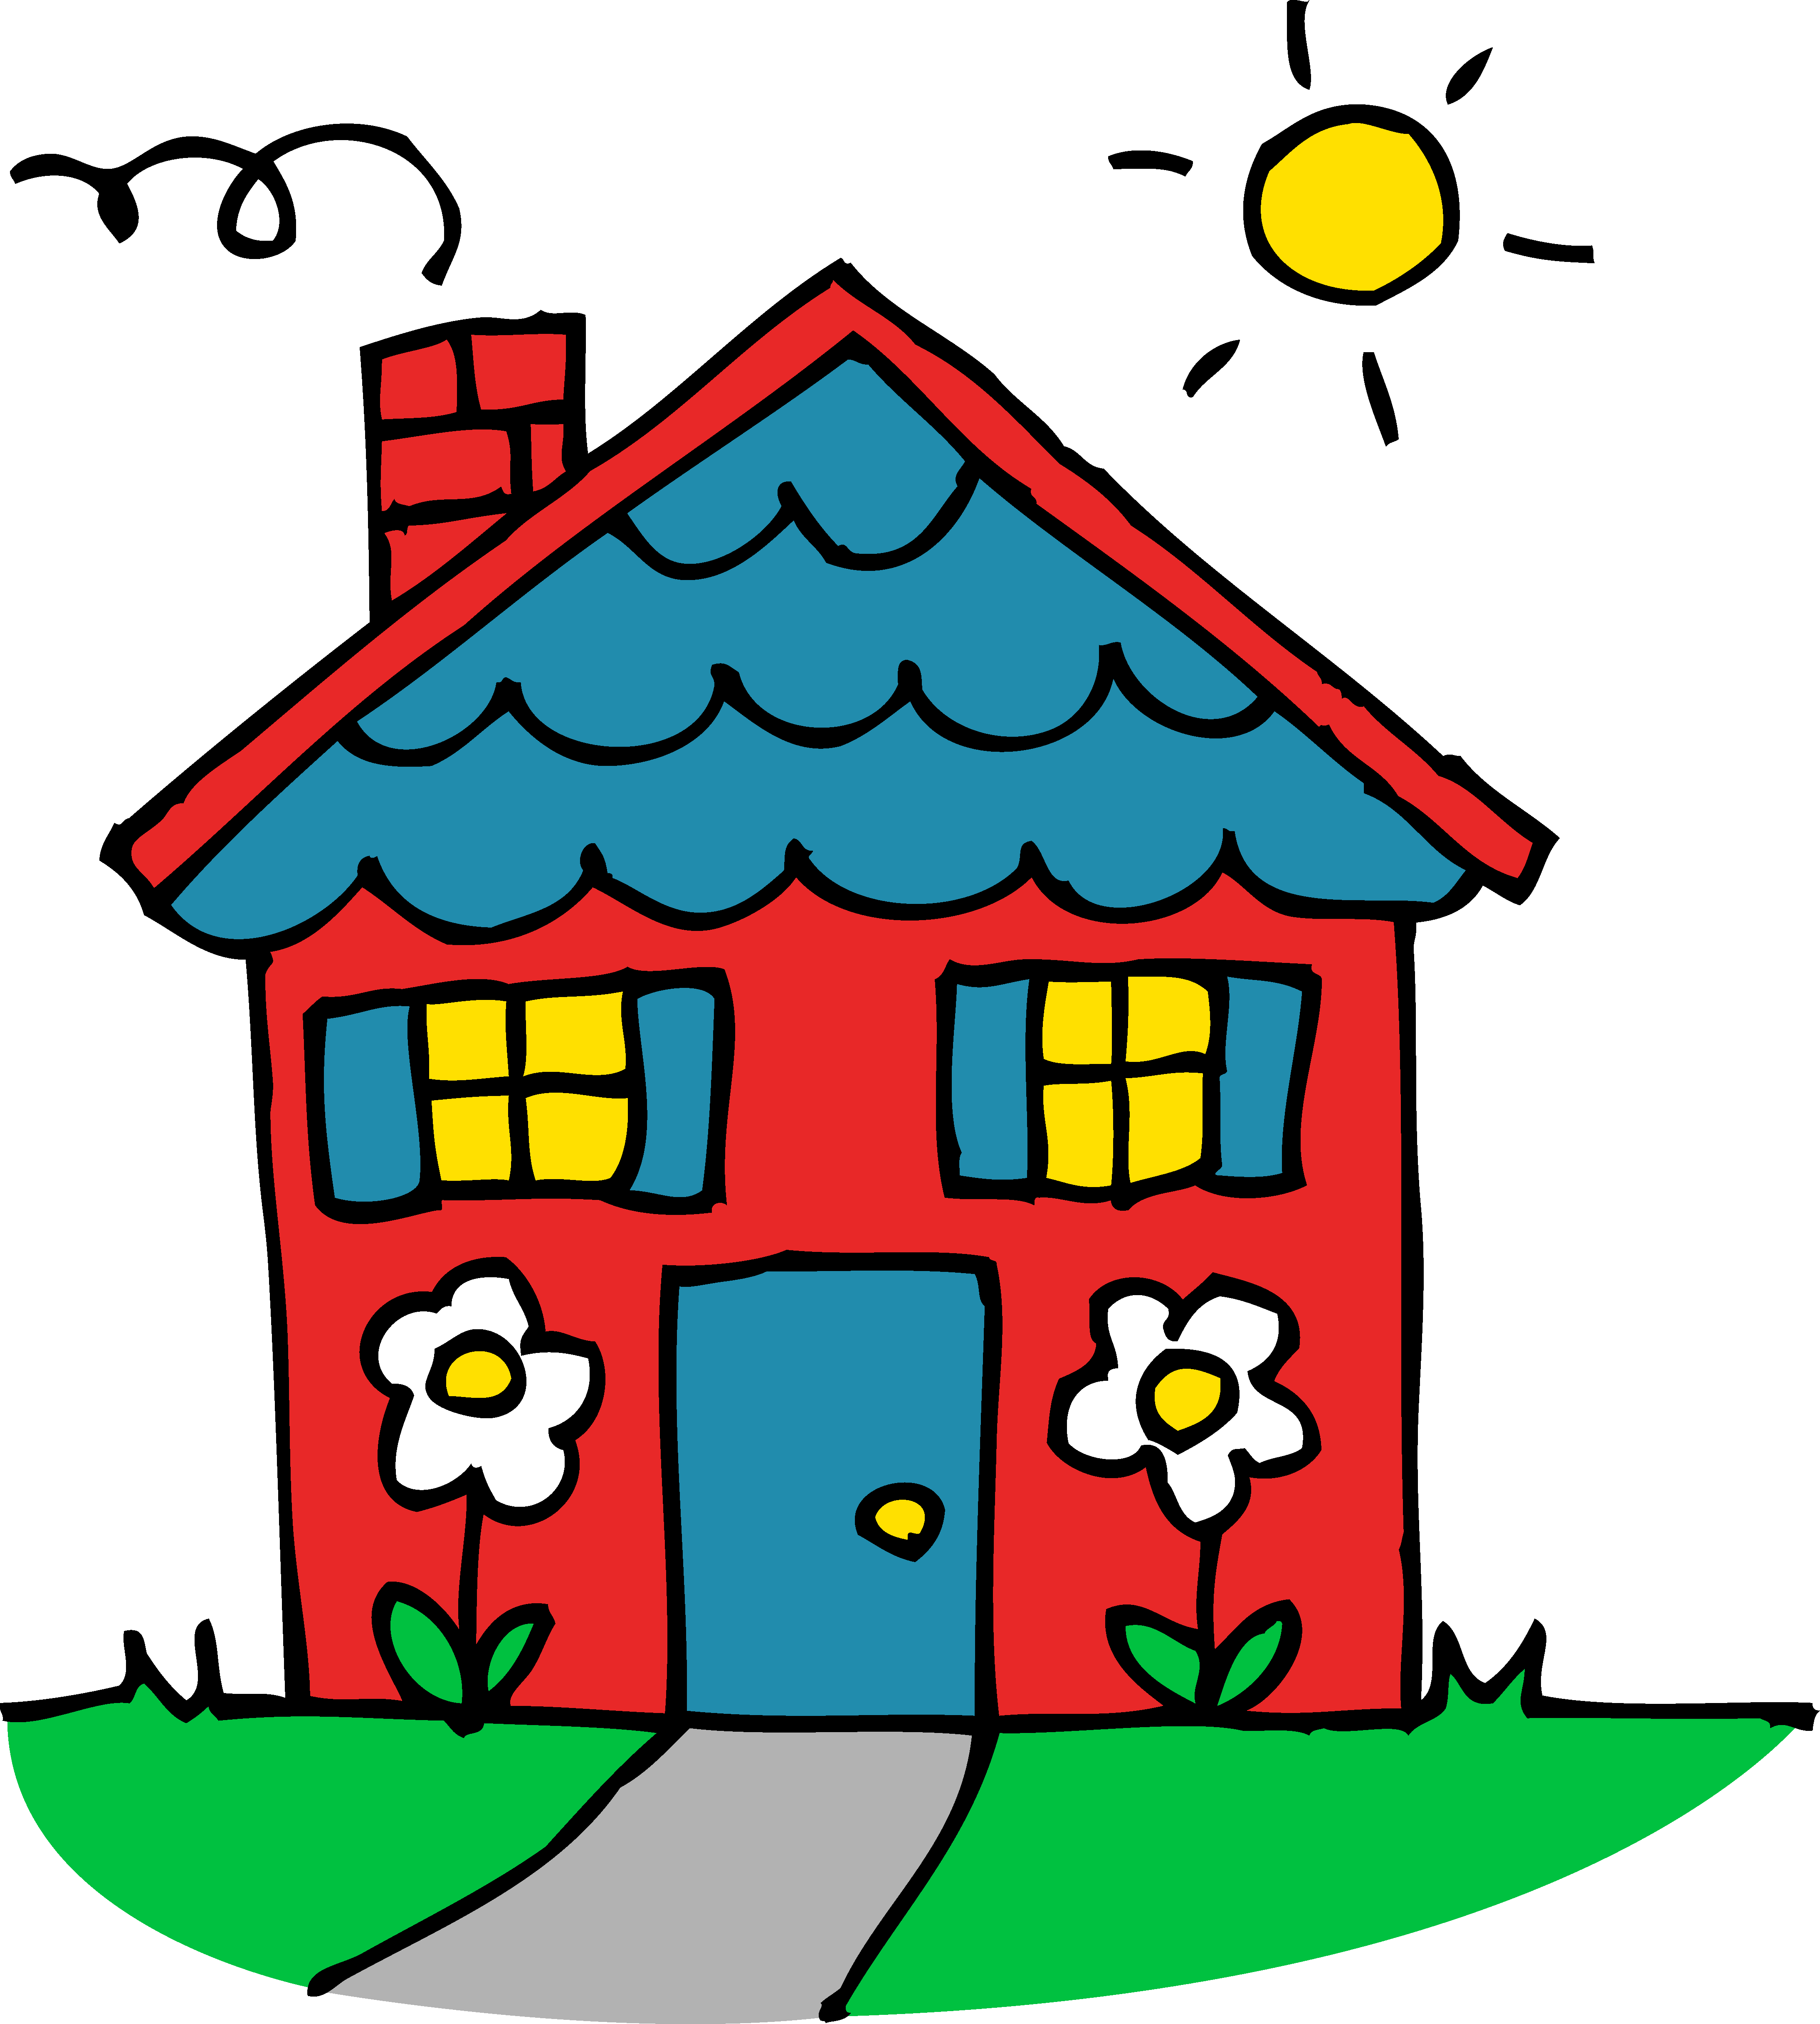 House For Sale Clip Art-house for sale clip art-9